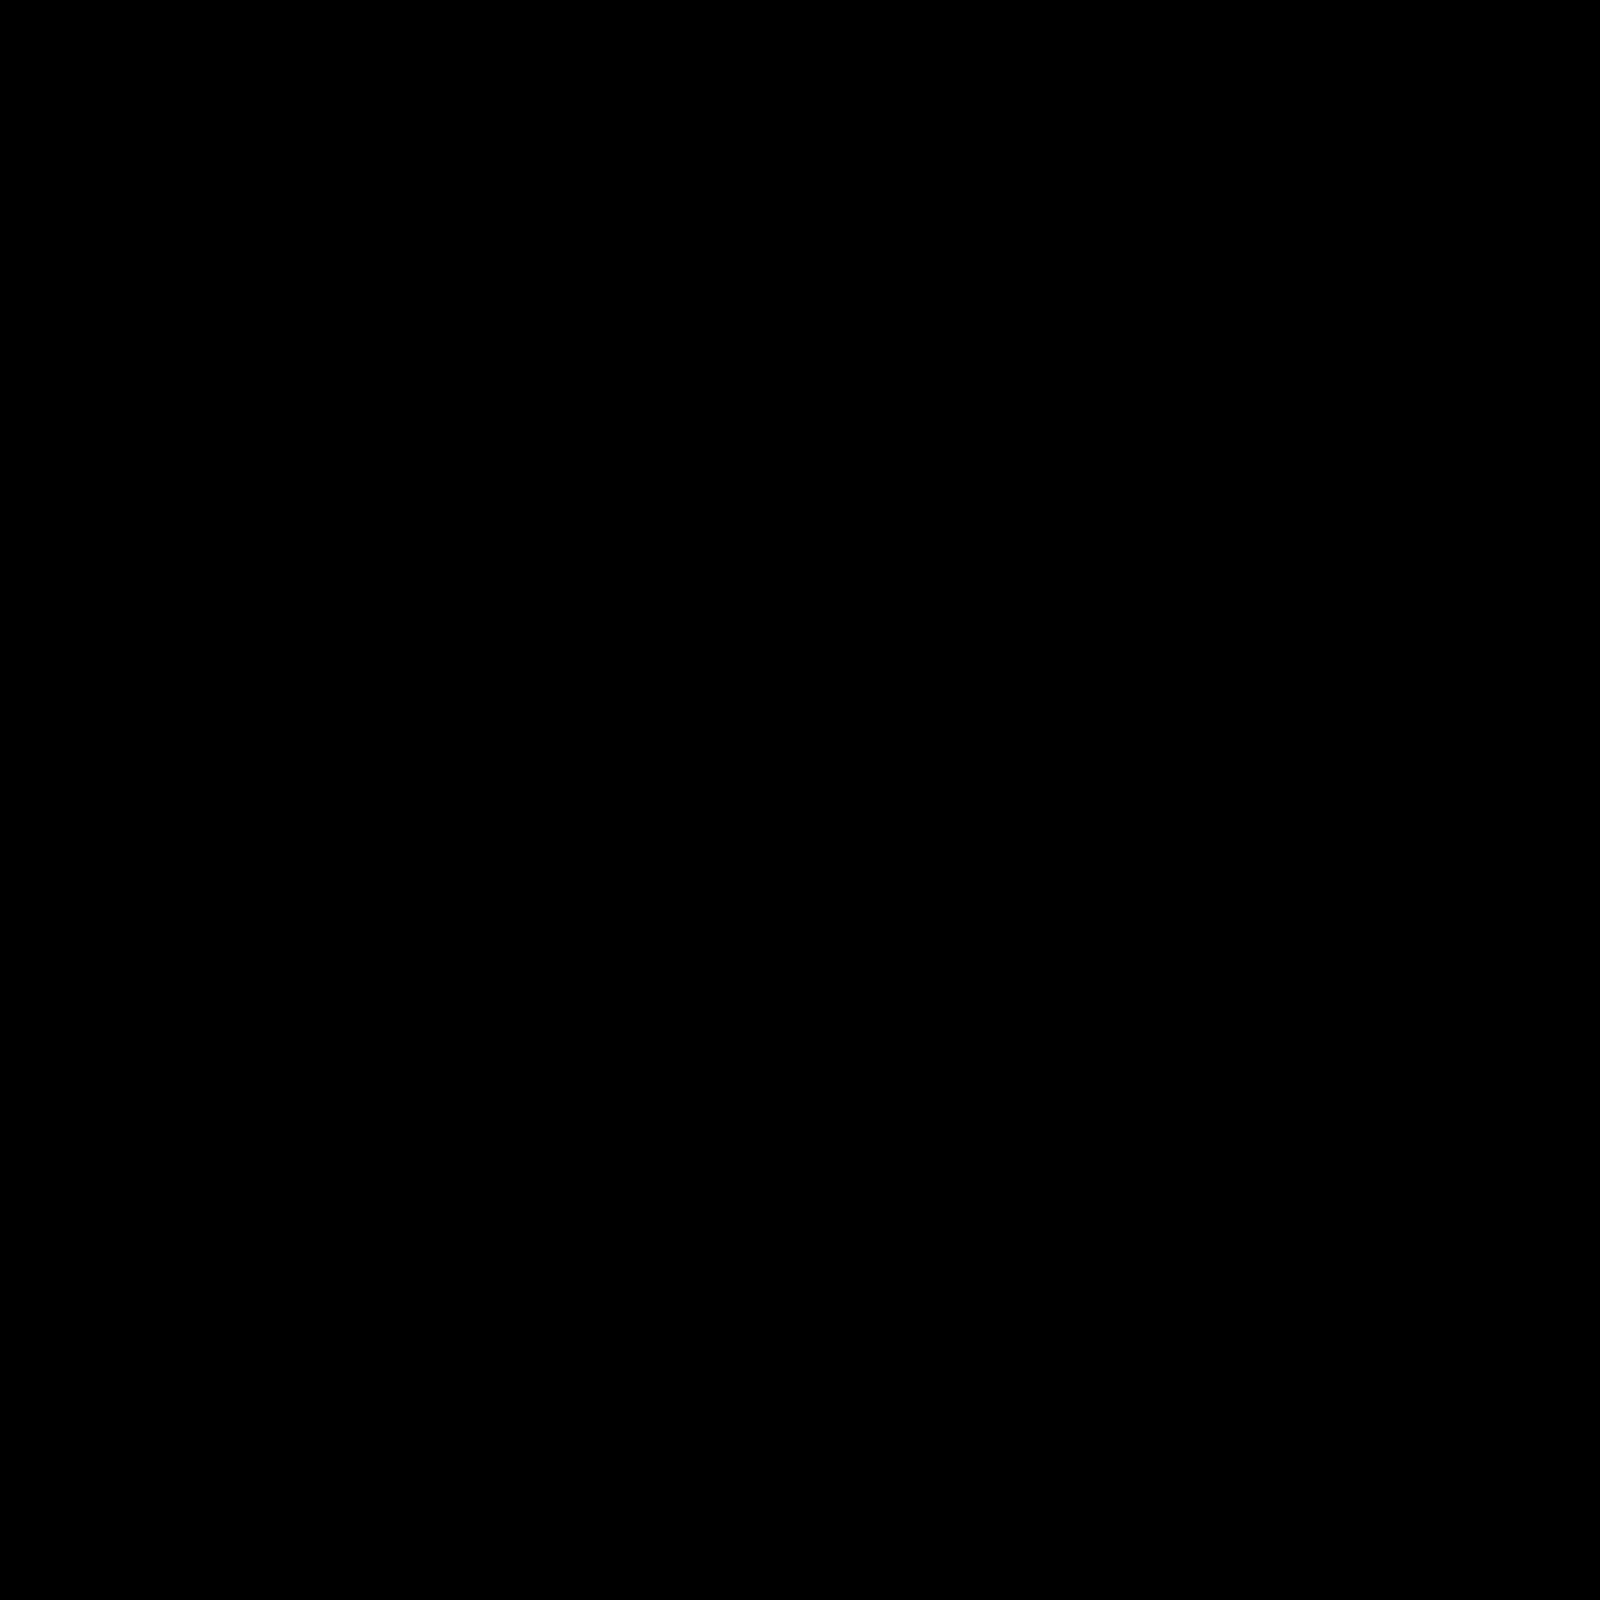 Nawigacja icon